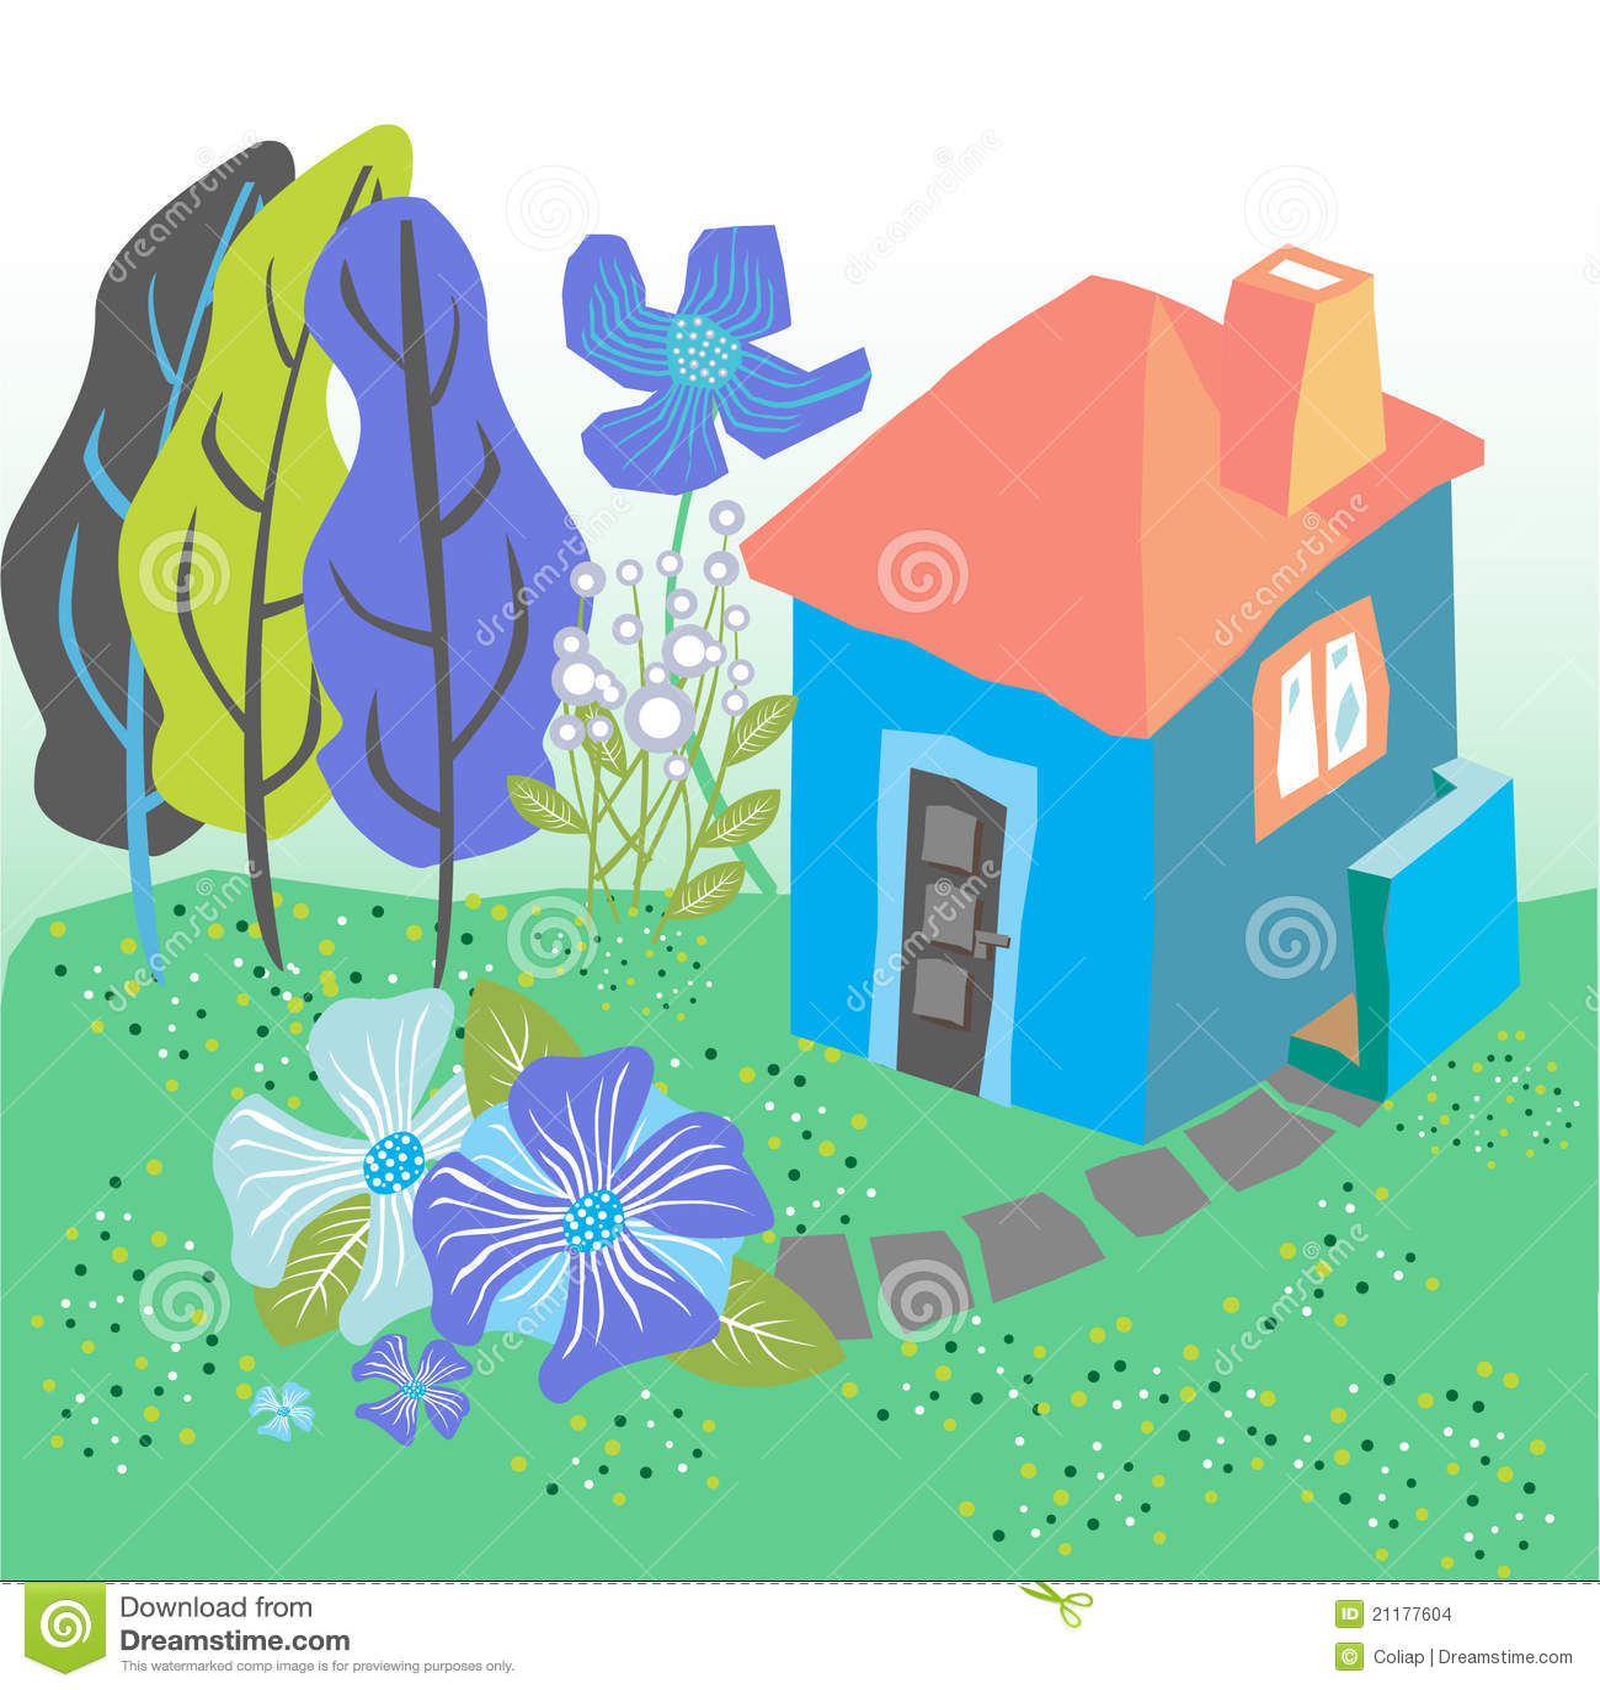 Fairytale house illustration